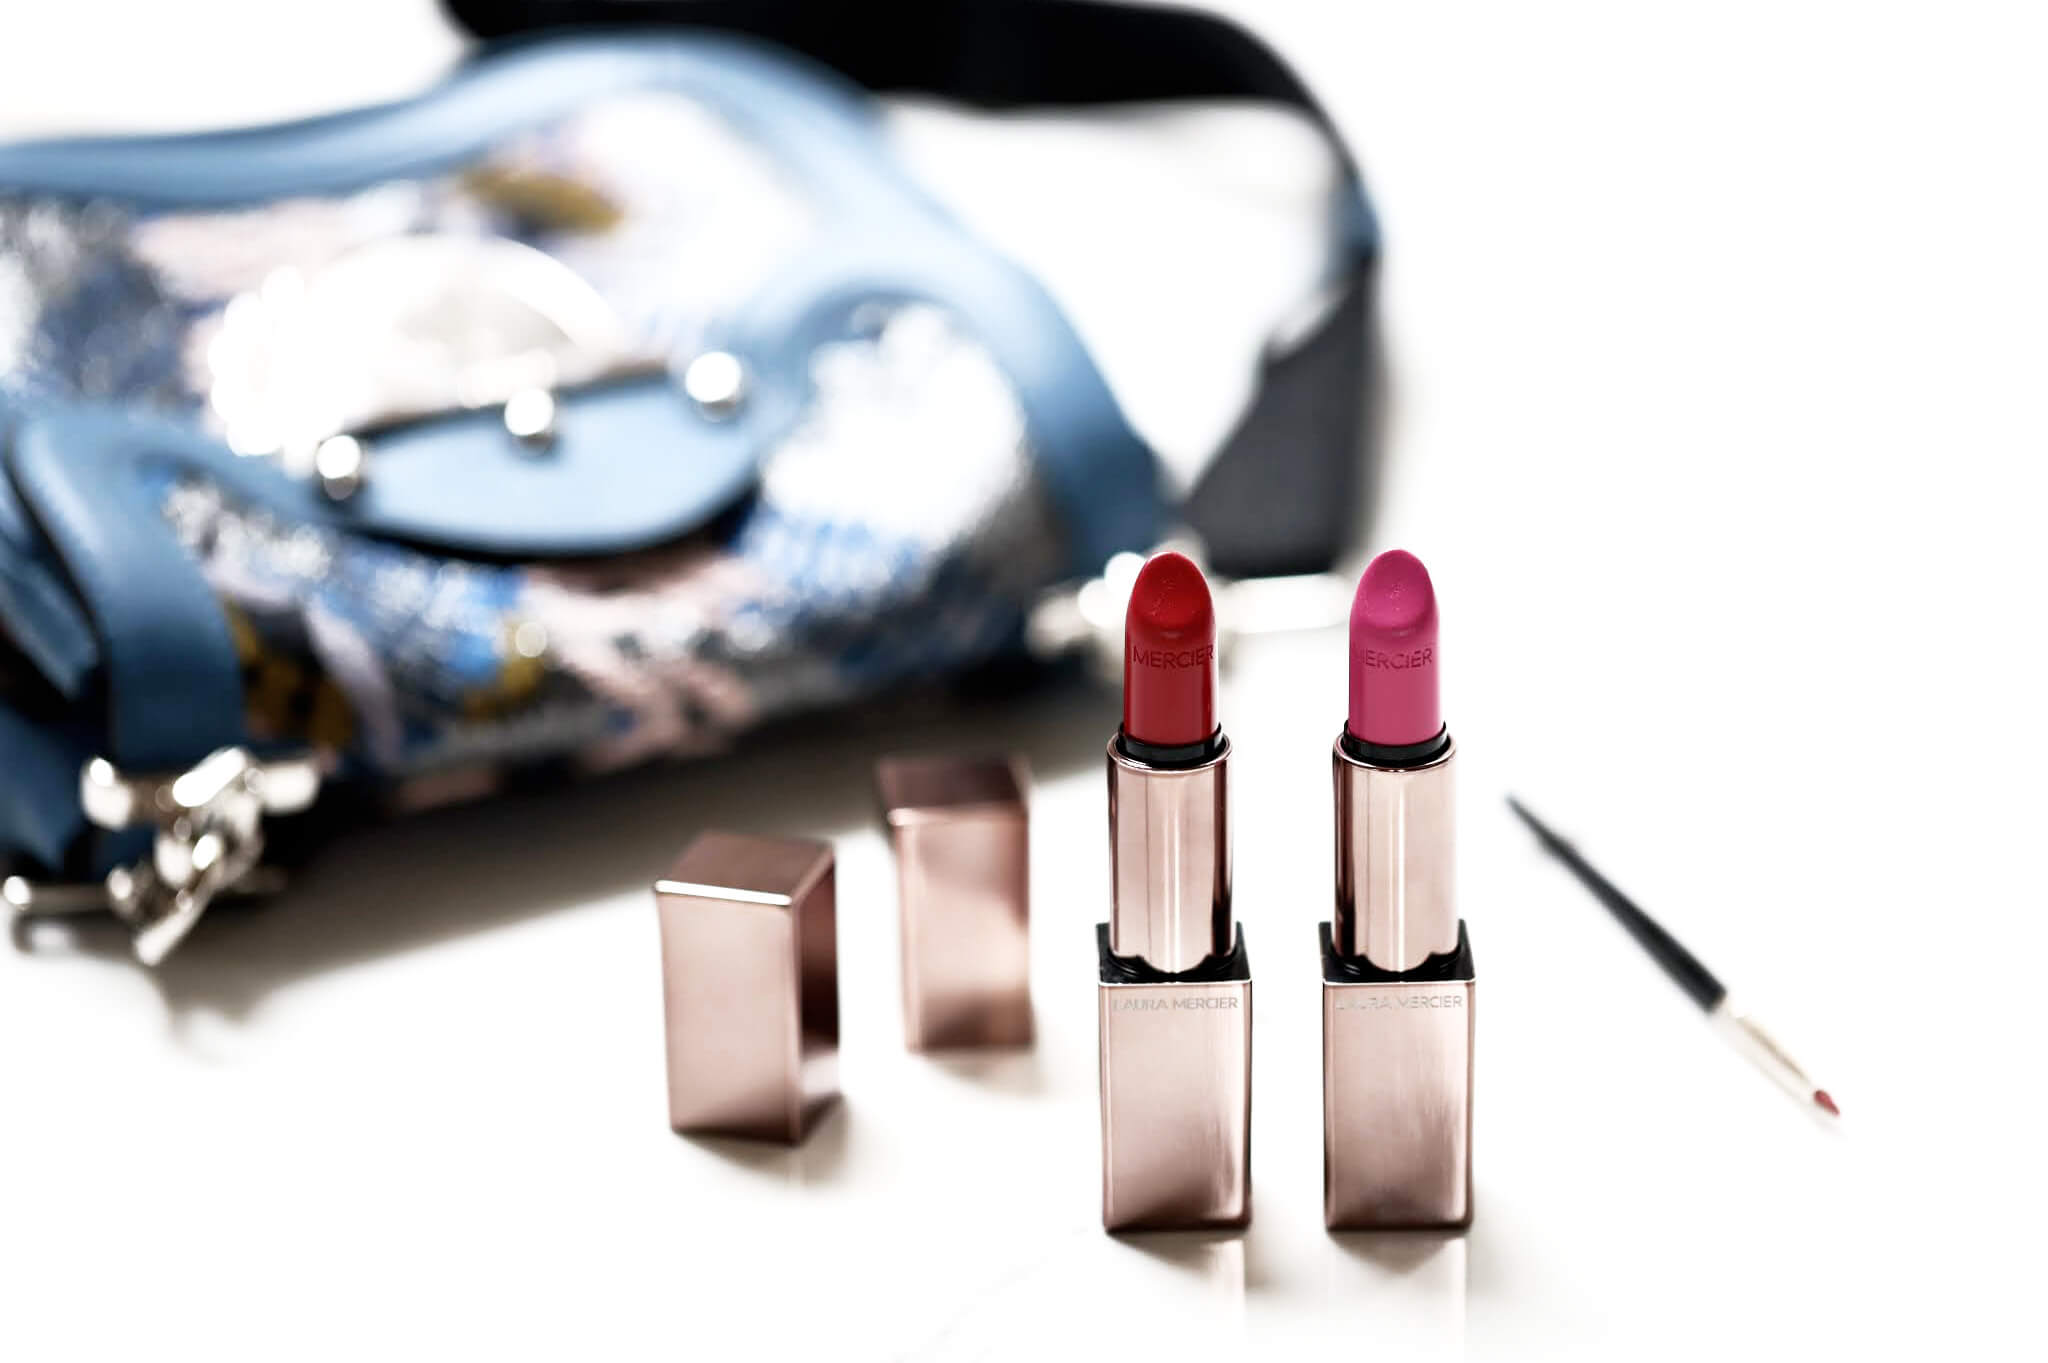 Laura Mercier Rouge Essentiel Rouge Ultime Classique Pink